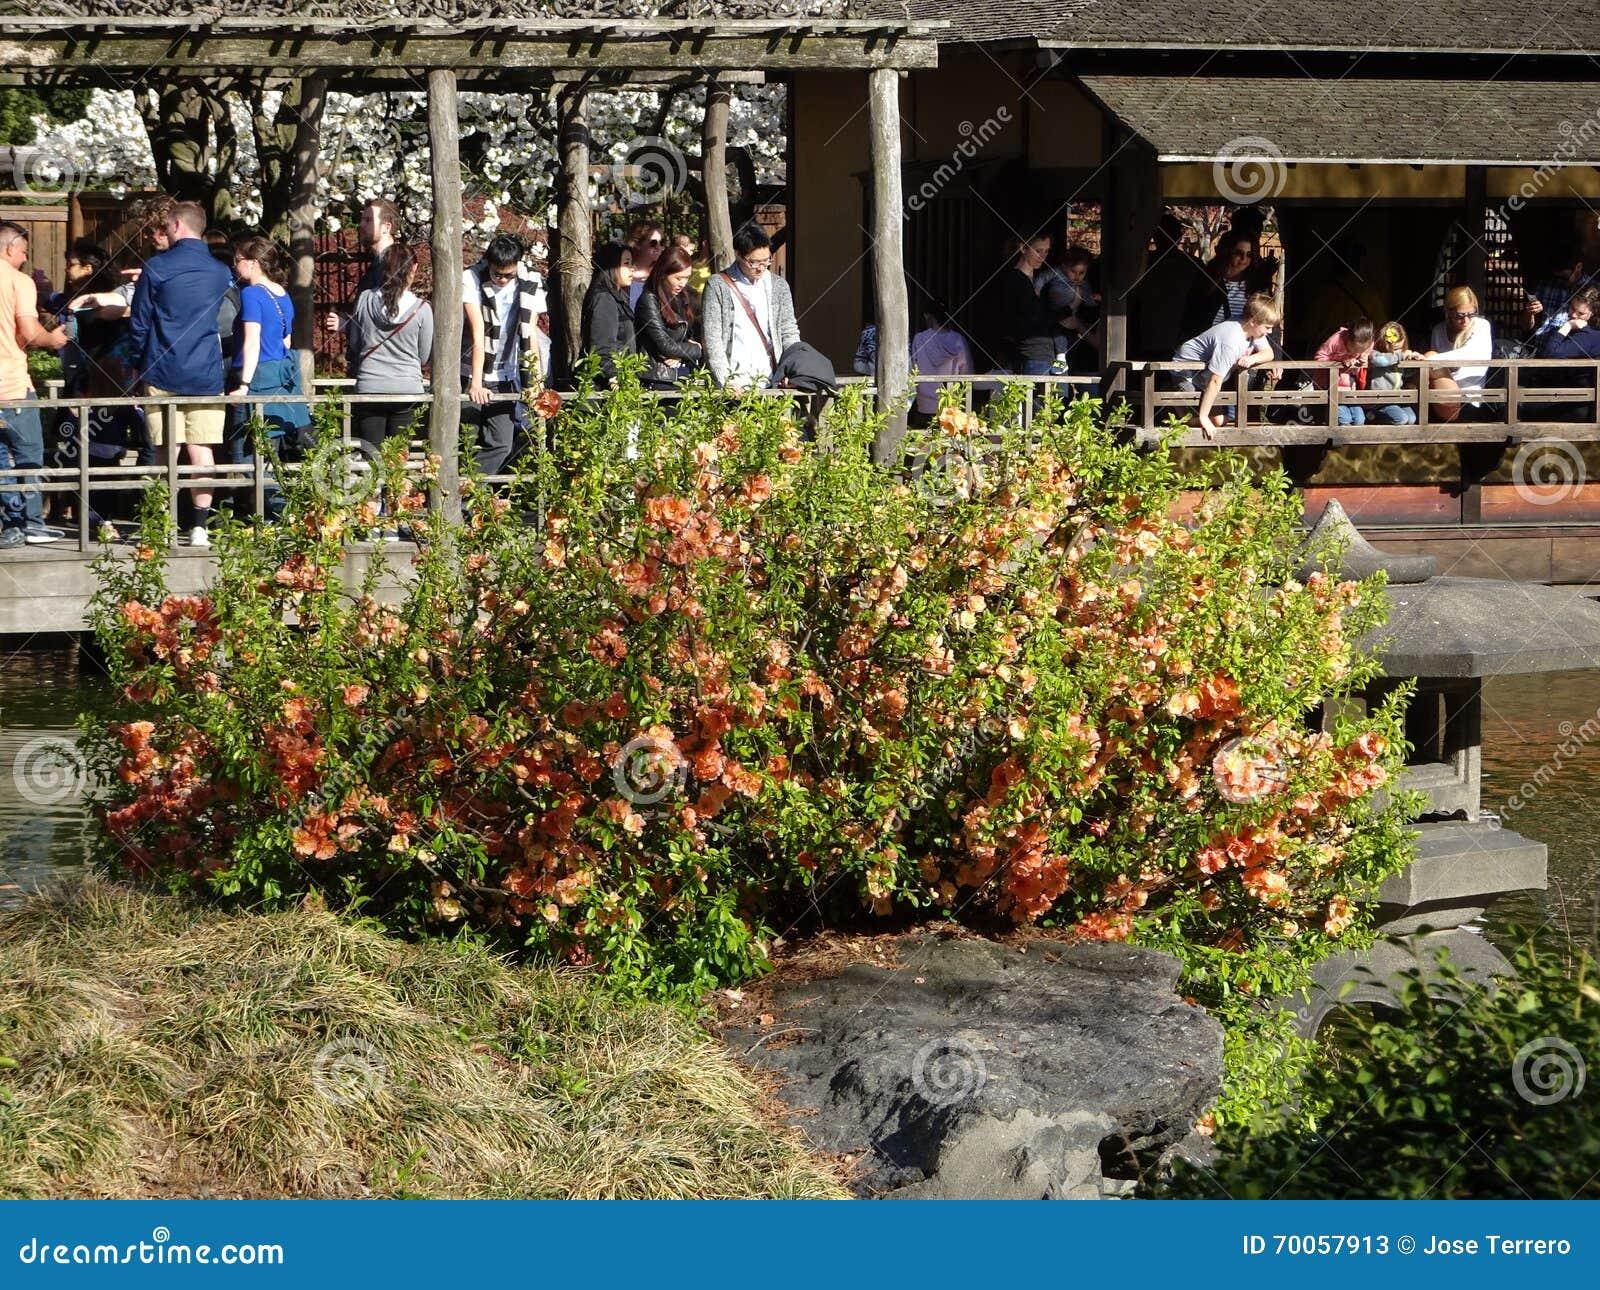 Brooklyn Botanic Garden April 2016 Part 3 39 Editorial Stock Photo Image Of Park Prospect